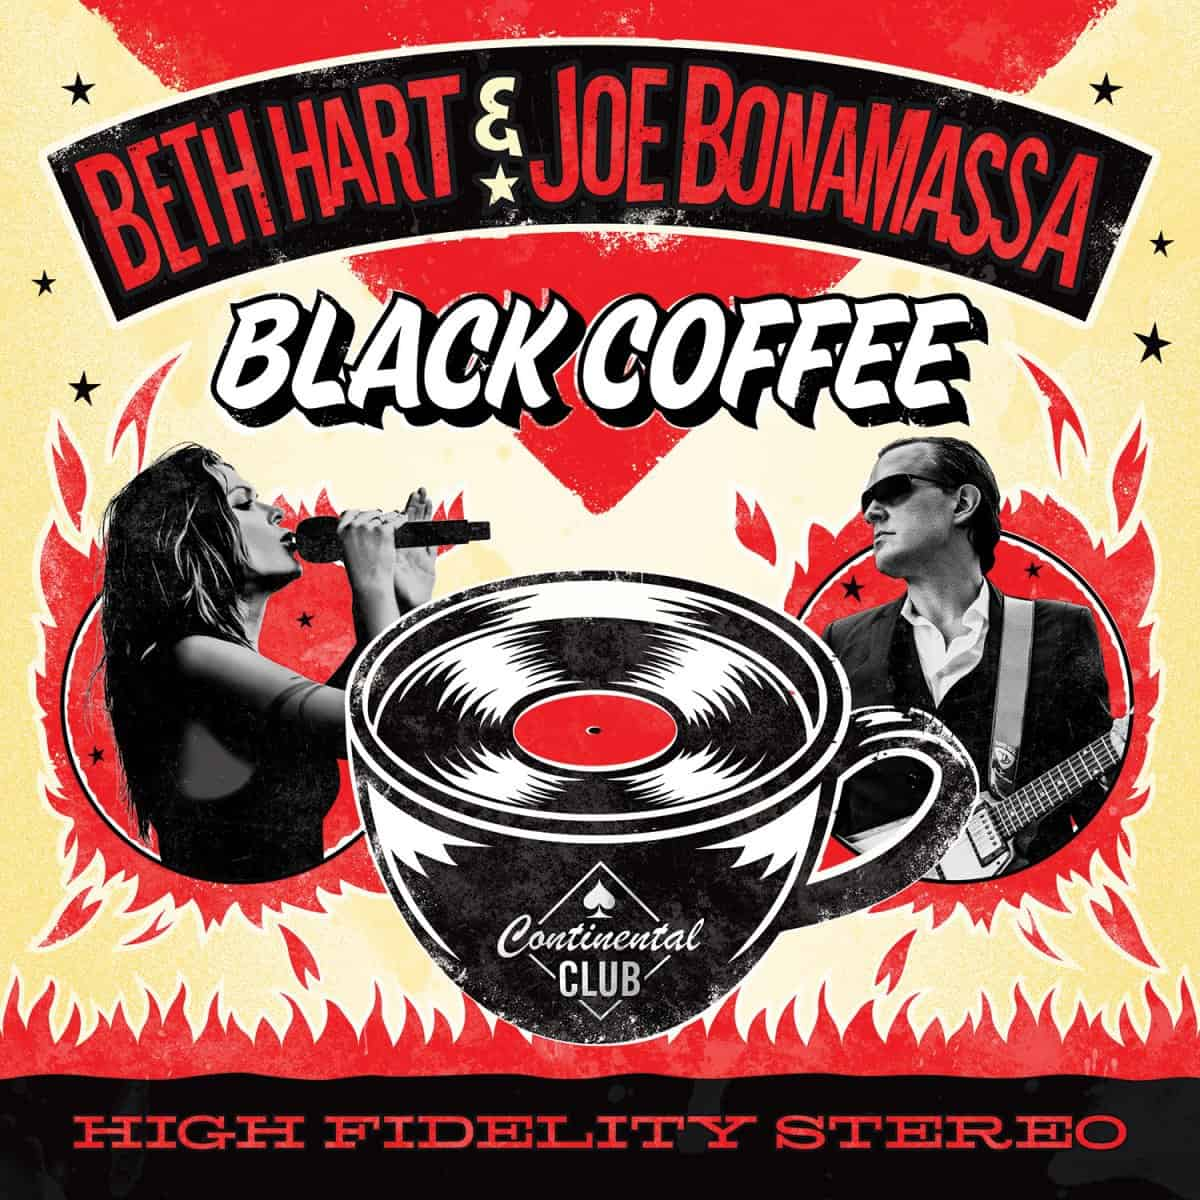 Beth-Hart-and-Joe-Bonamassa-Black-Coffee